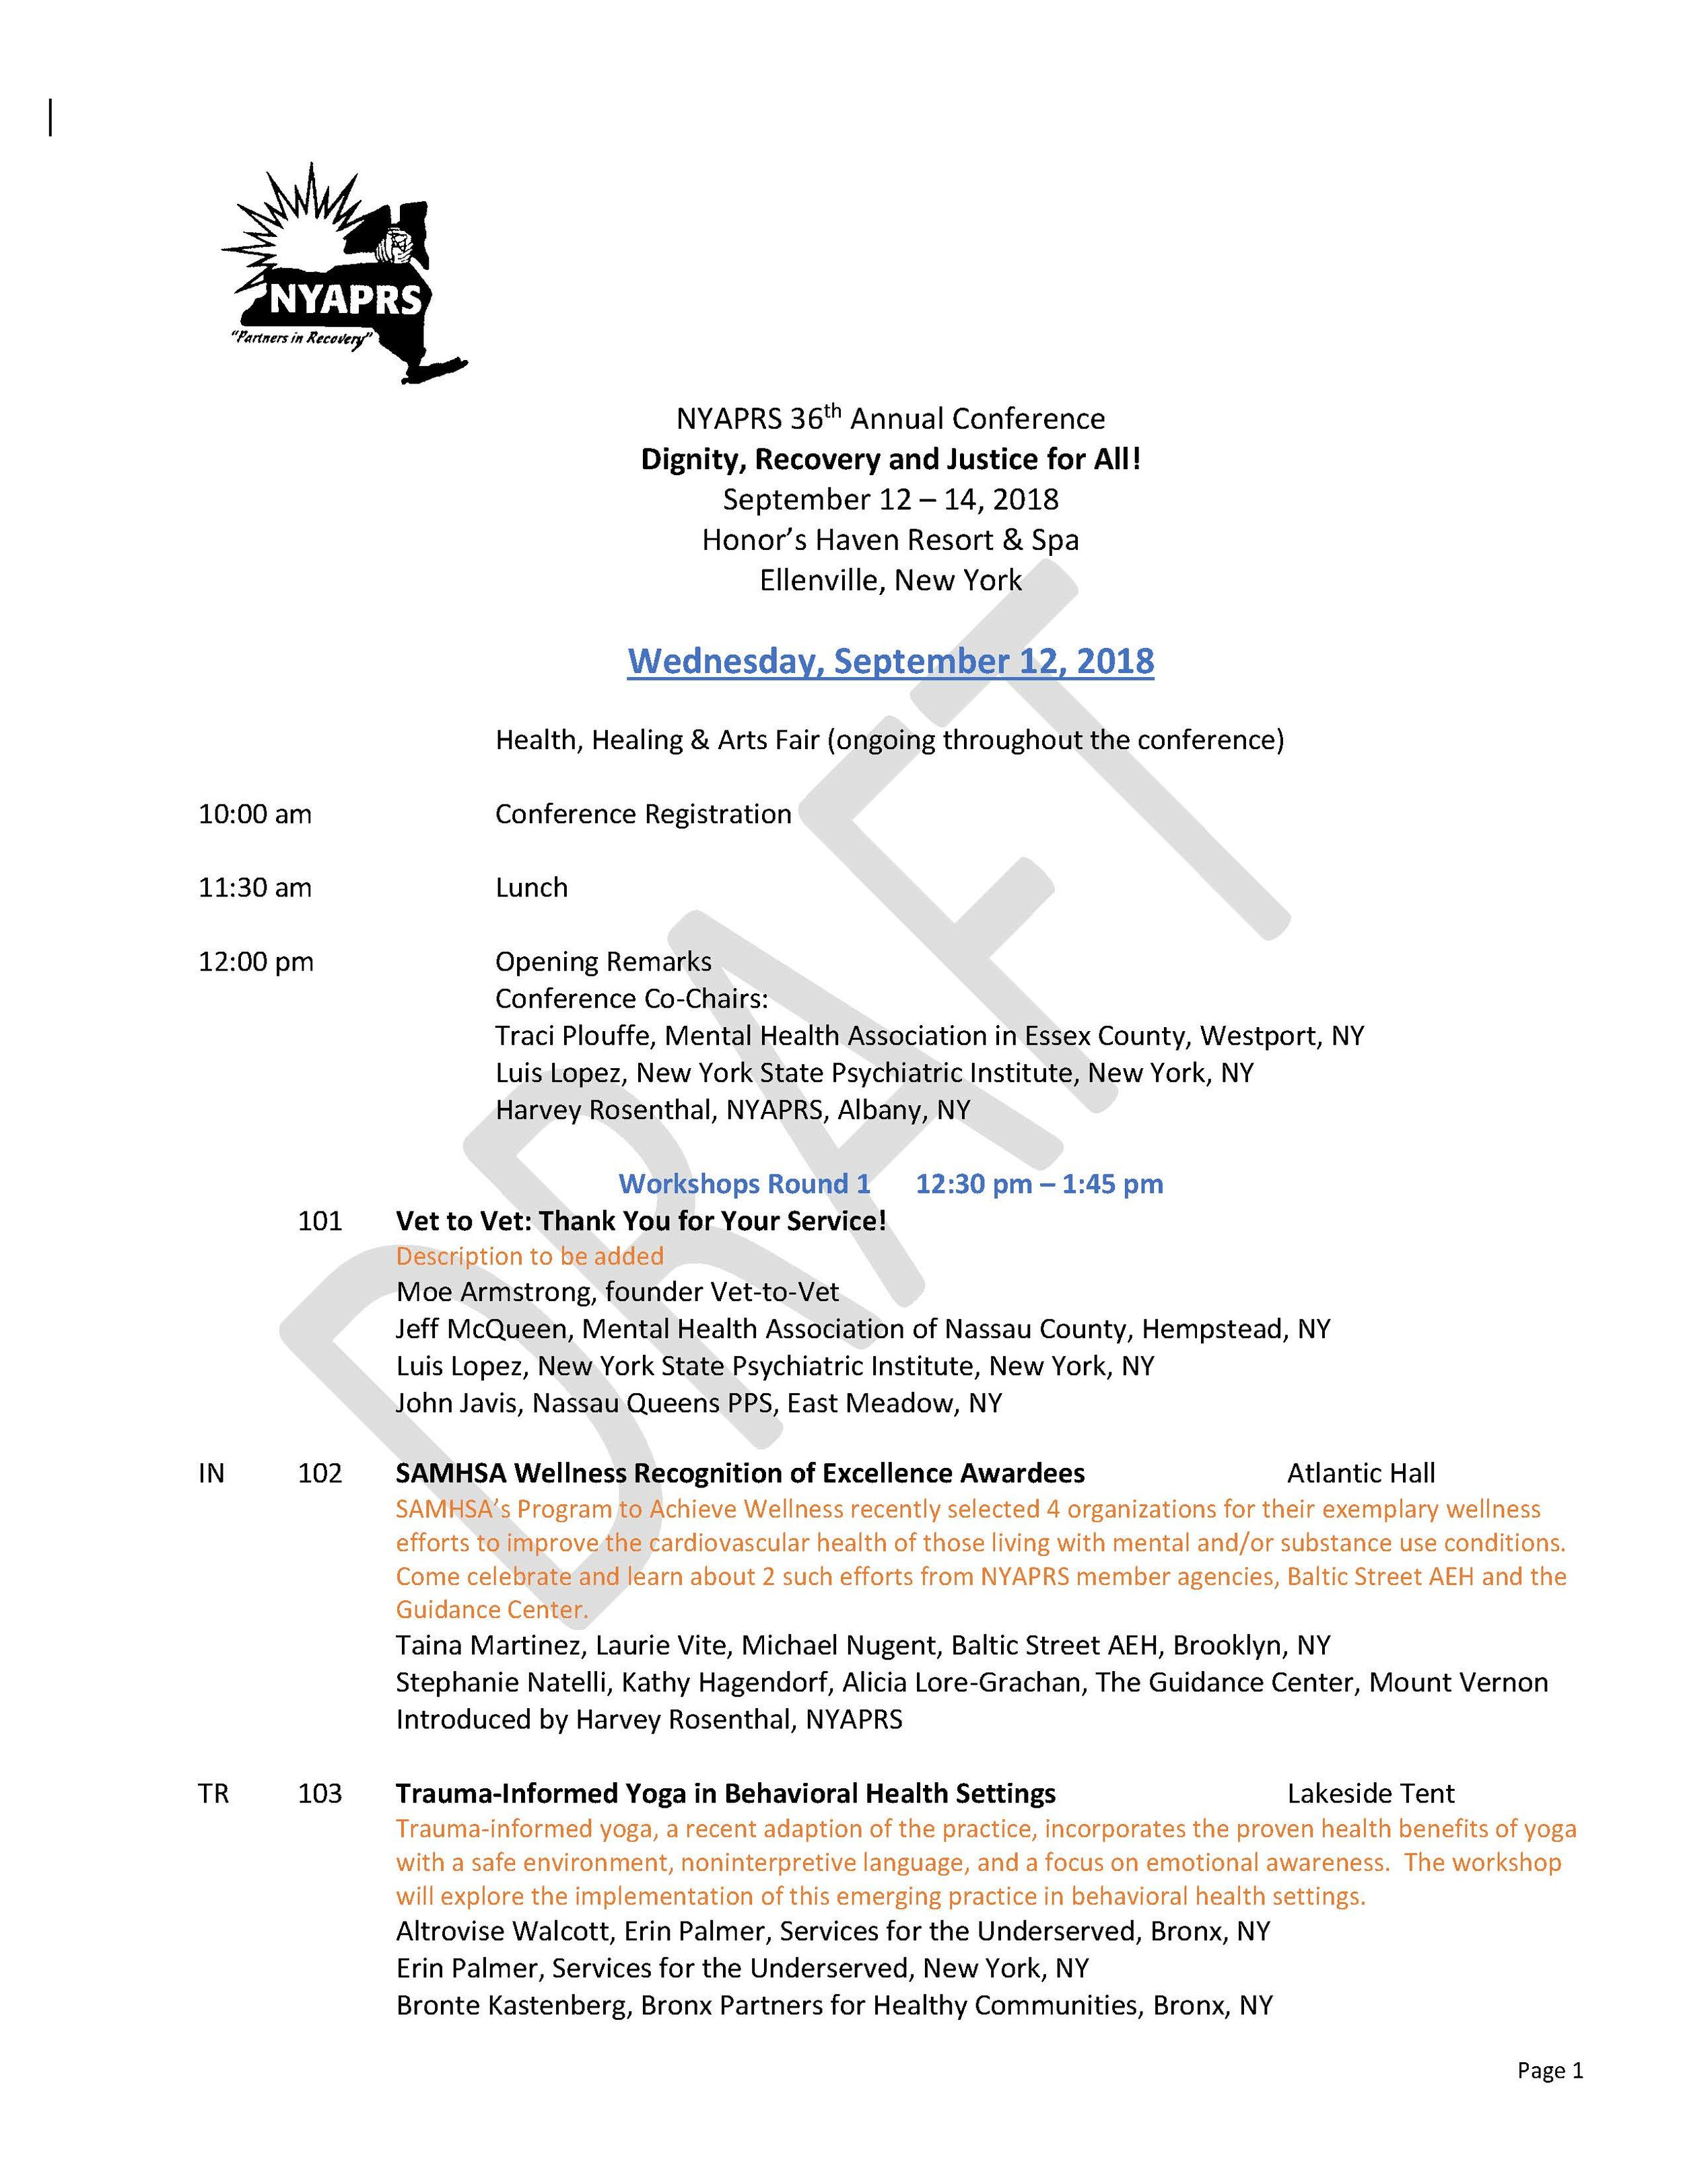 Click Image to Download Draft PDF